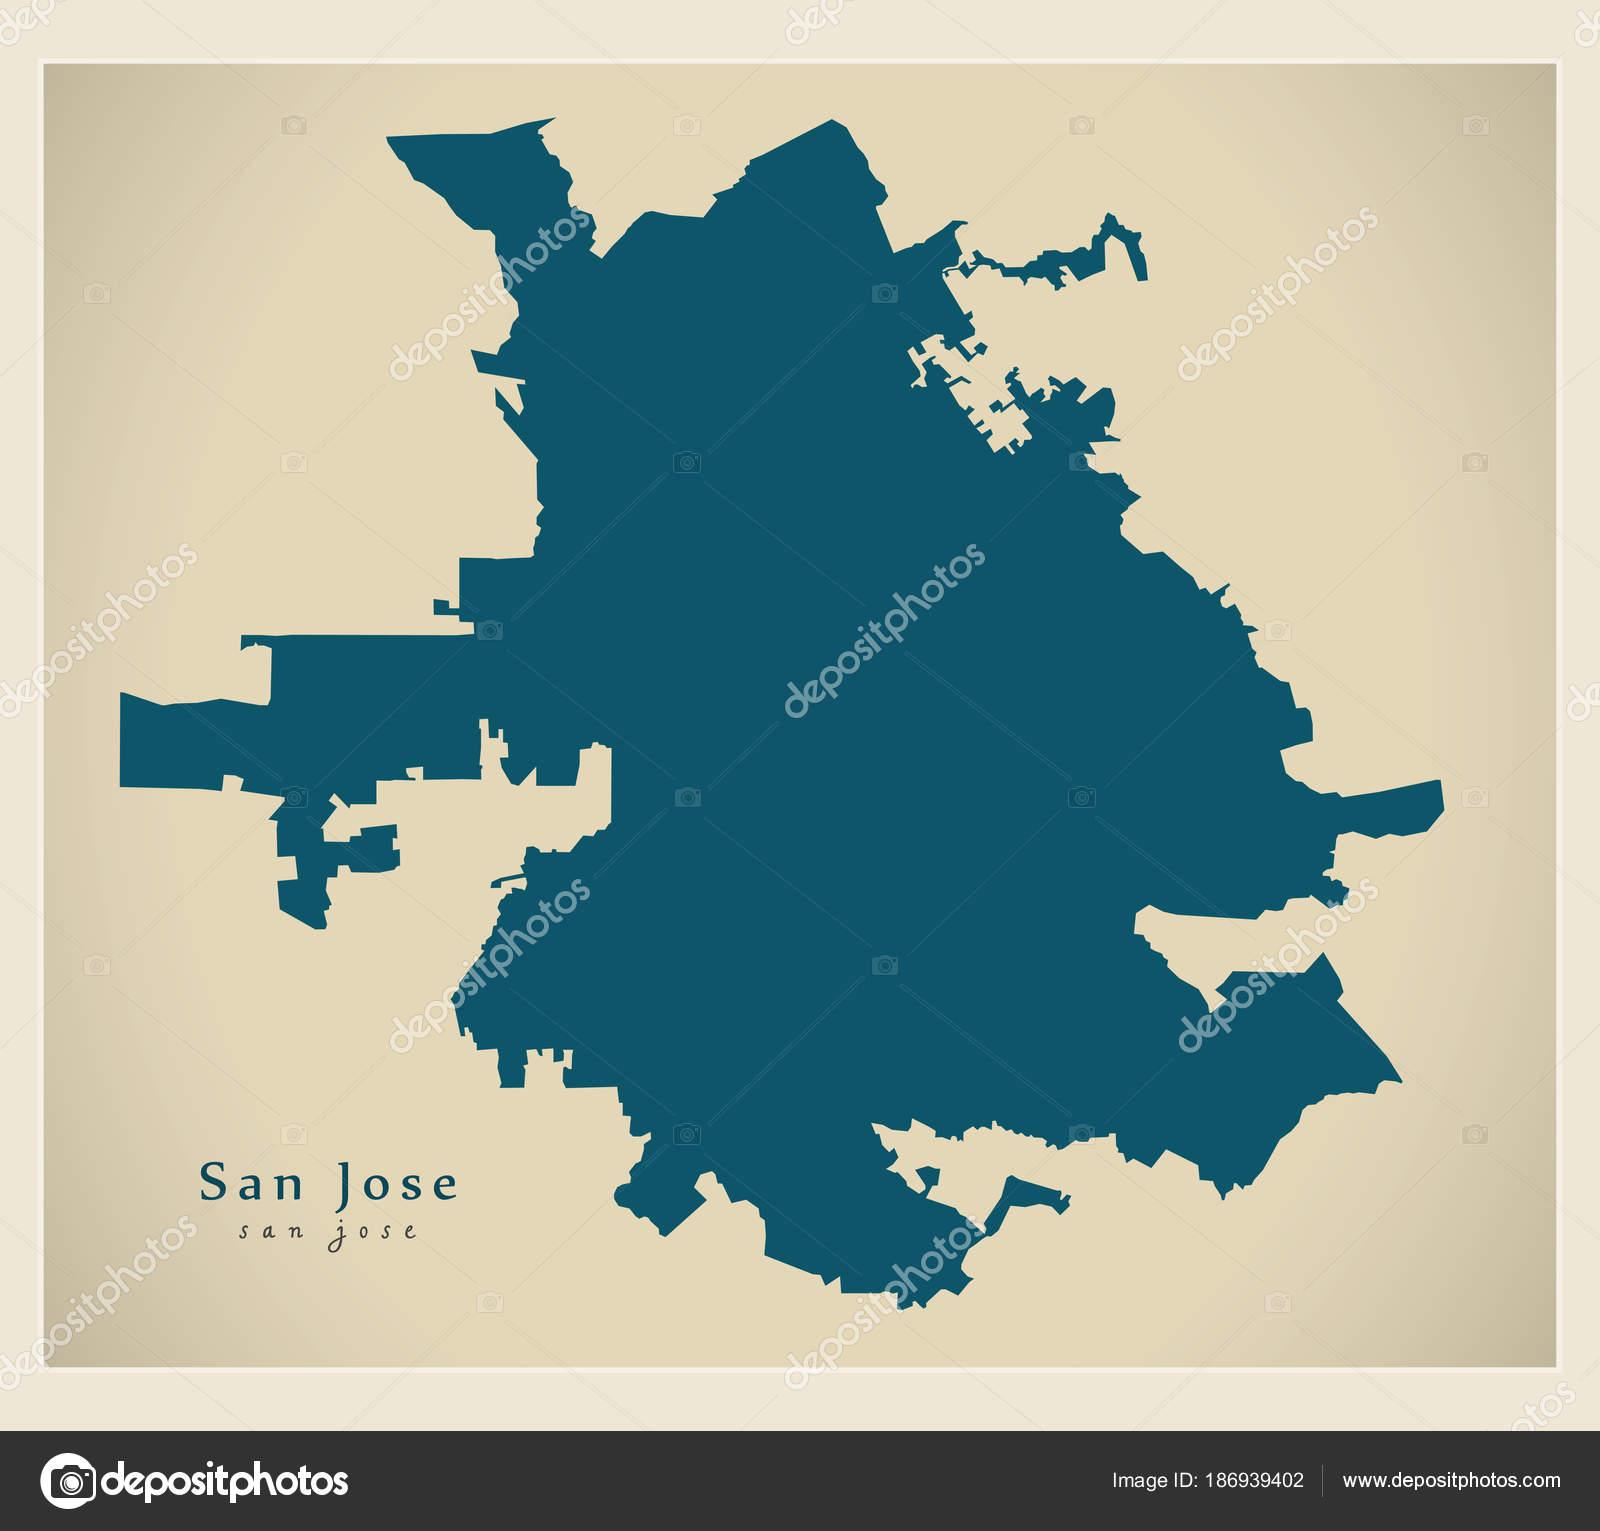 Modern Map - San Jose California USA city map — Stock Vector ... on santa barbara, seattle map, santa cruz california map, orange county california map, silicon valley, newport beach california map, stanford california map, mountain view california map, miami florida map, hayward california map, winchester mystery house, santa clara california map, moraga california map, big sur california map, san francisco, san diego, long beach, palo alto california map, santa clara, san antonio, fresno california map, monterey california map, oakland california map, san francisco bay area, redlands california map, cypress california map, northern california map, malibu california map, anaheim california map, los angeles, el paso, palo alto, santa cruz,